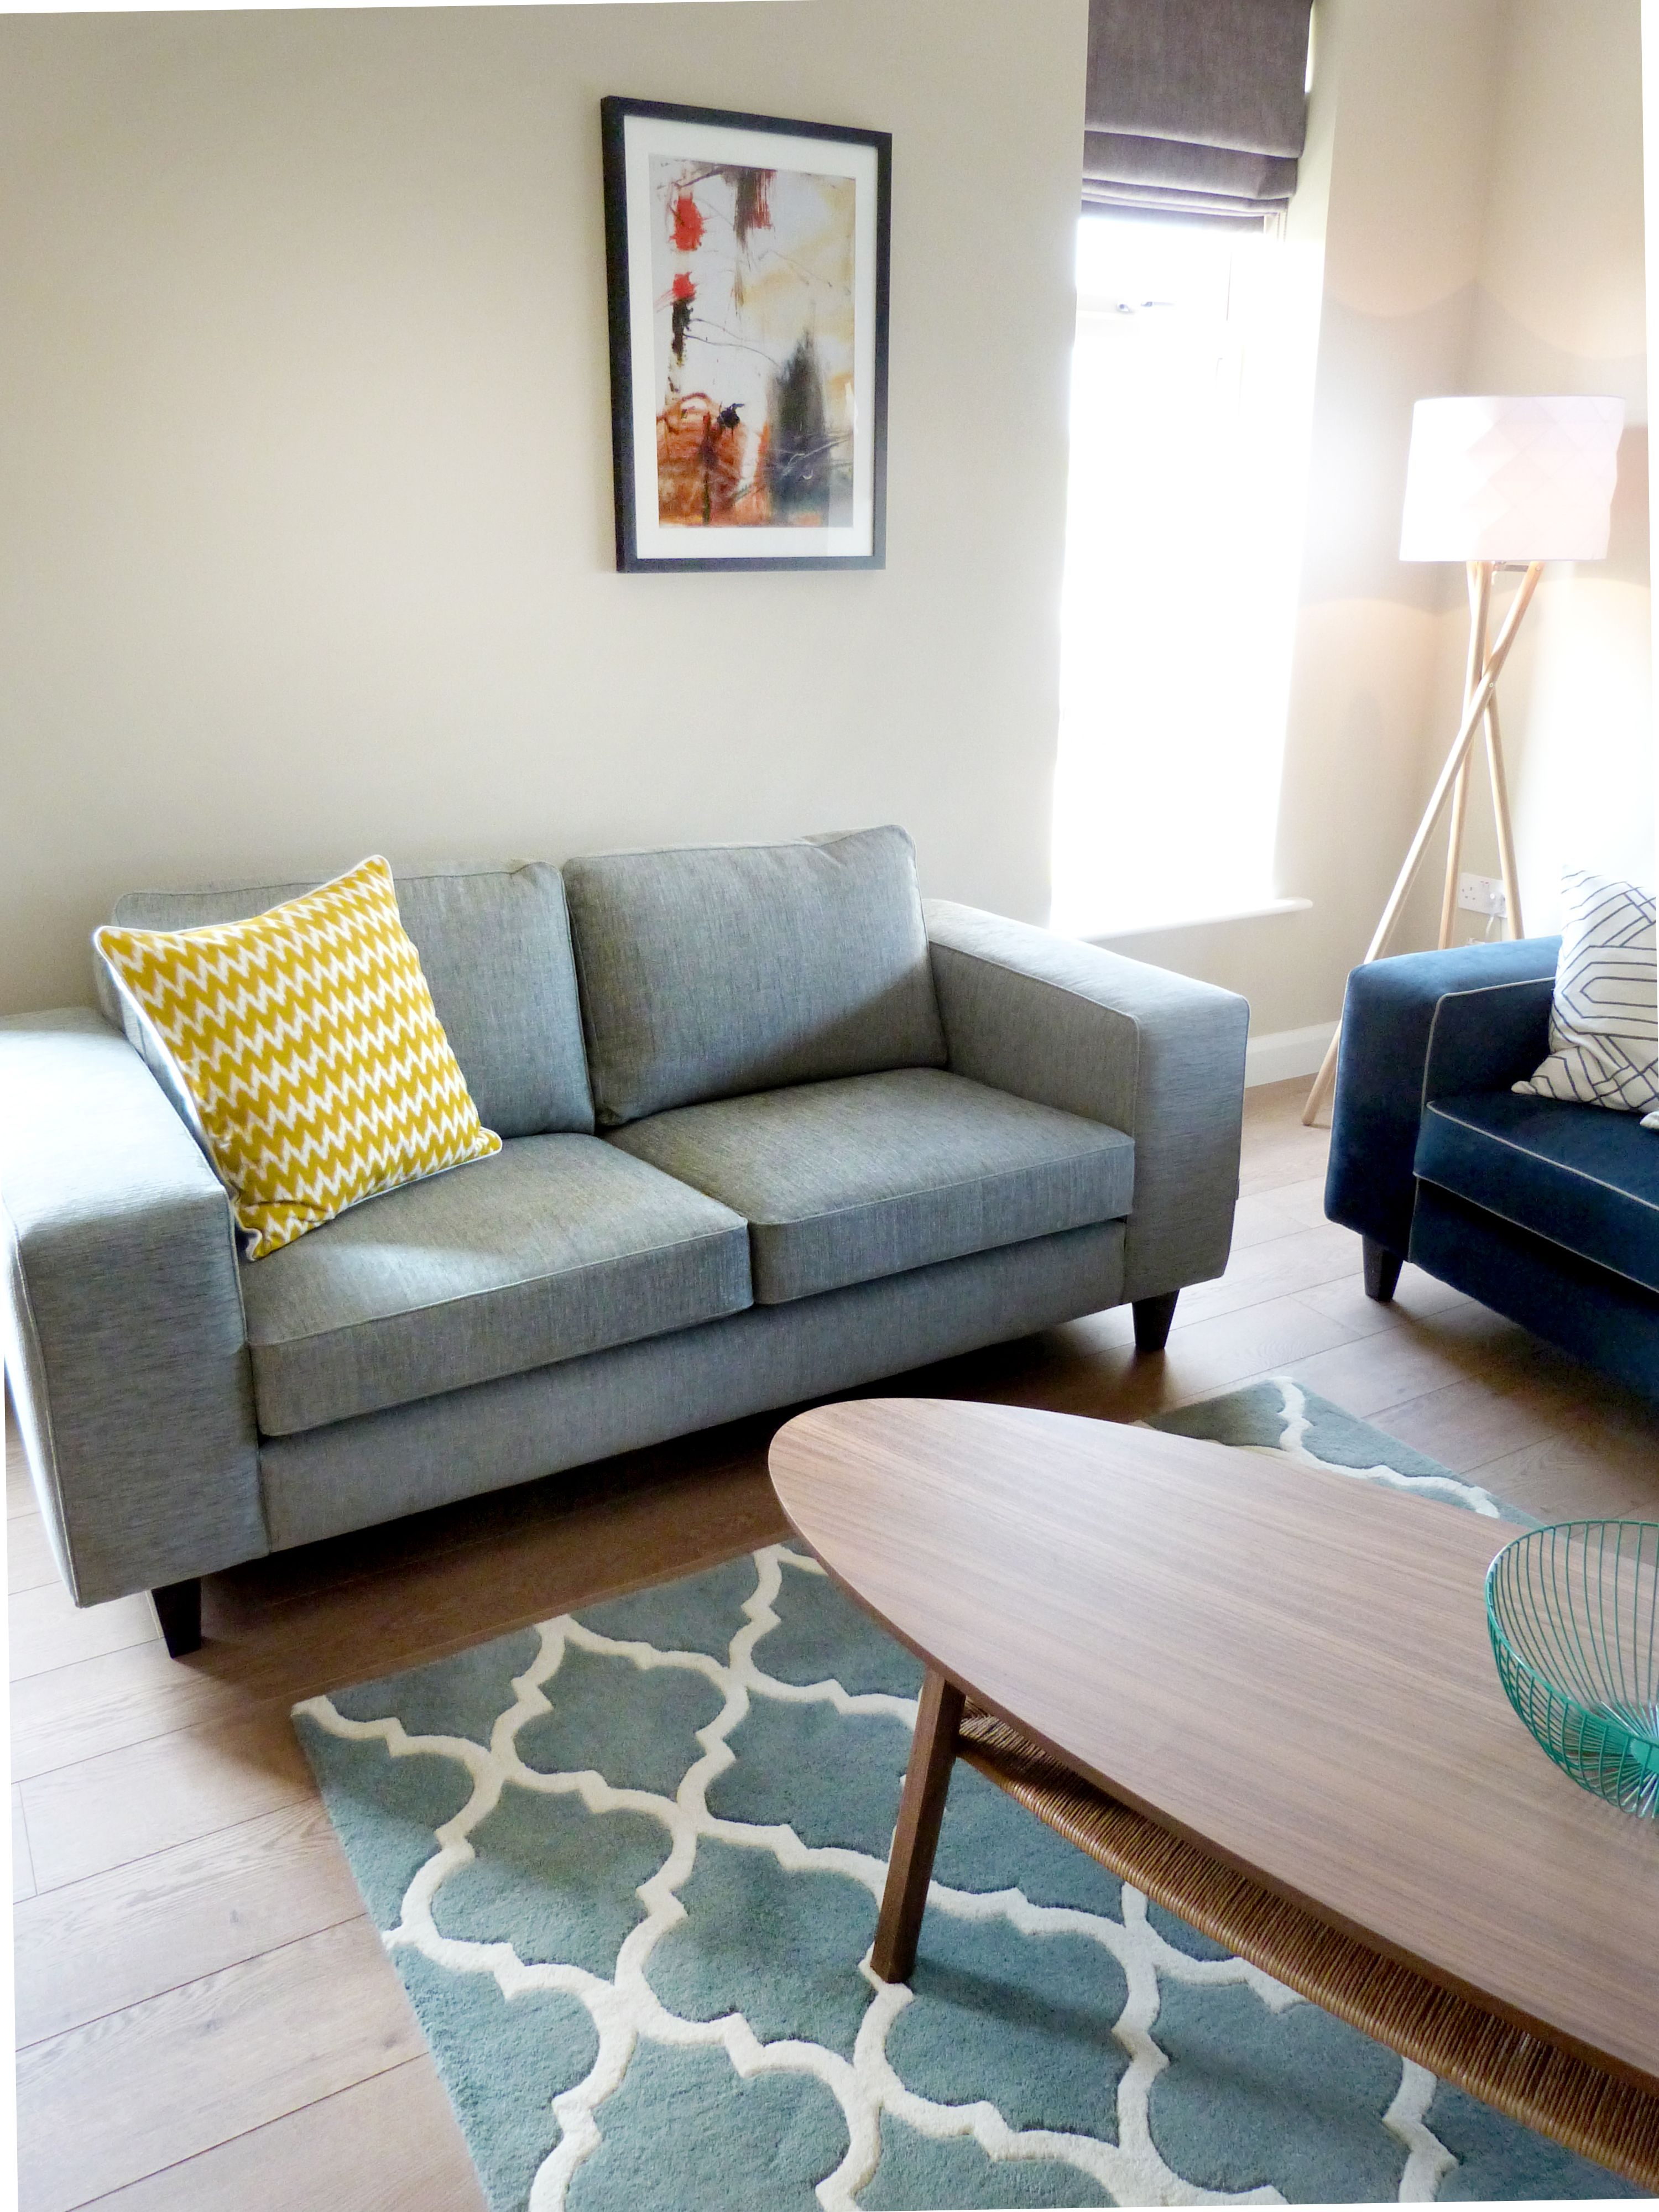 Residential Living Room Sofa Grey Ikea Stockhom Coffee Table